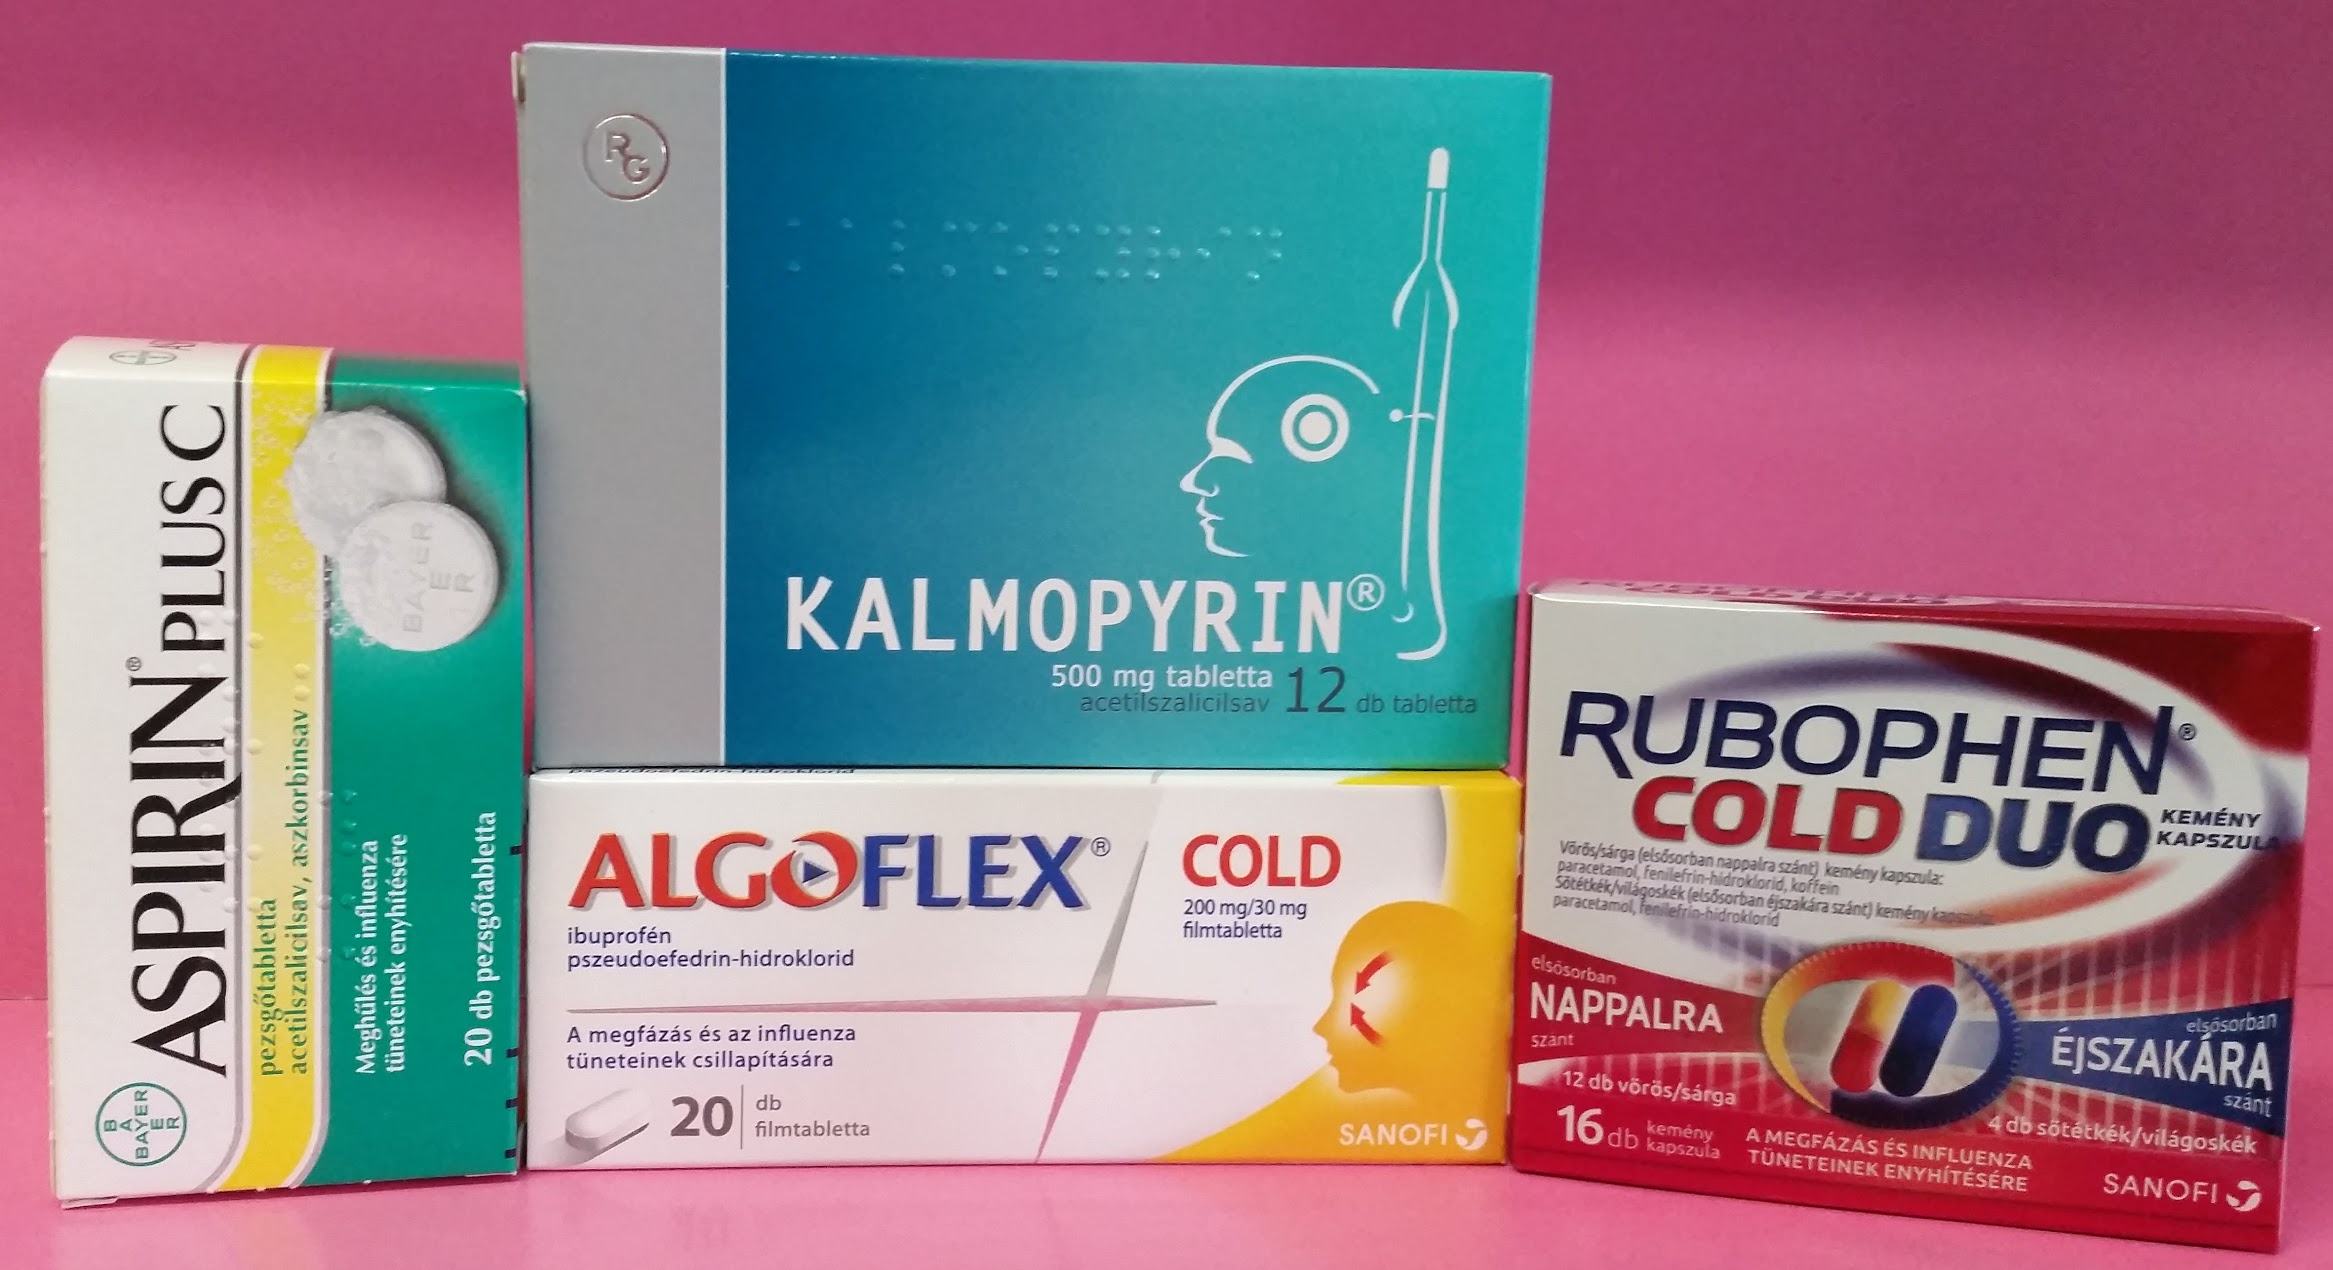 GLUCOSTABIL 30 mg módosított hatóanyagleadású tabletta